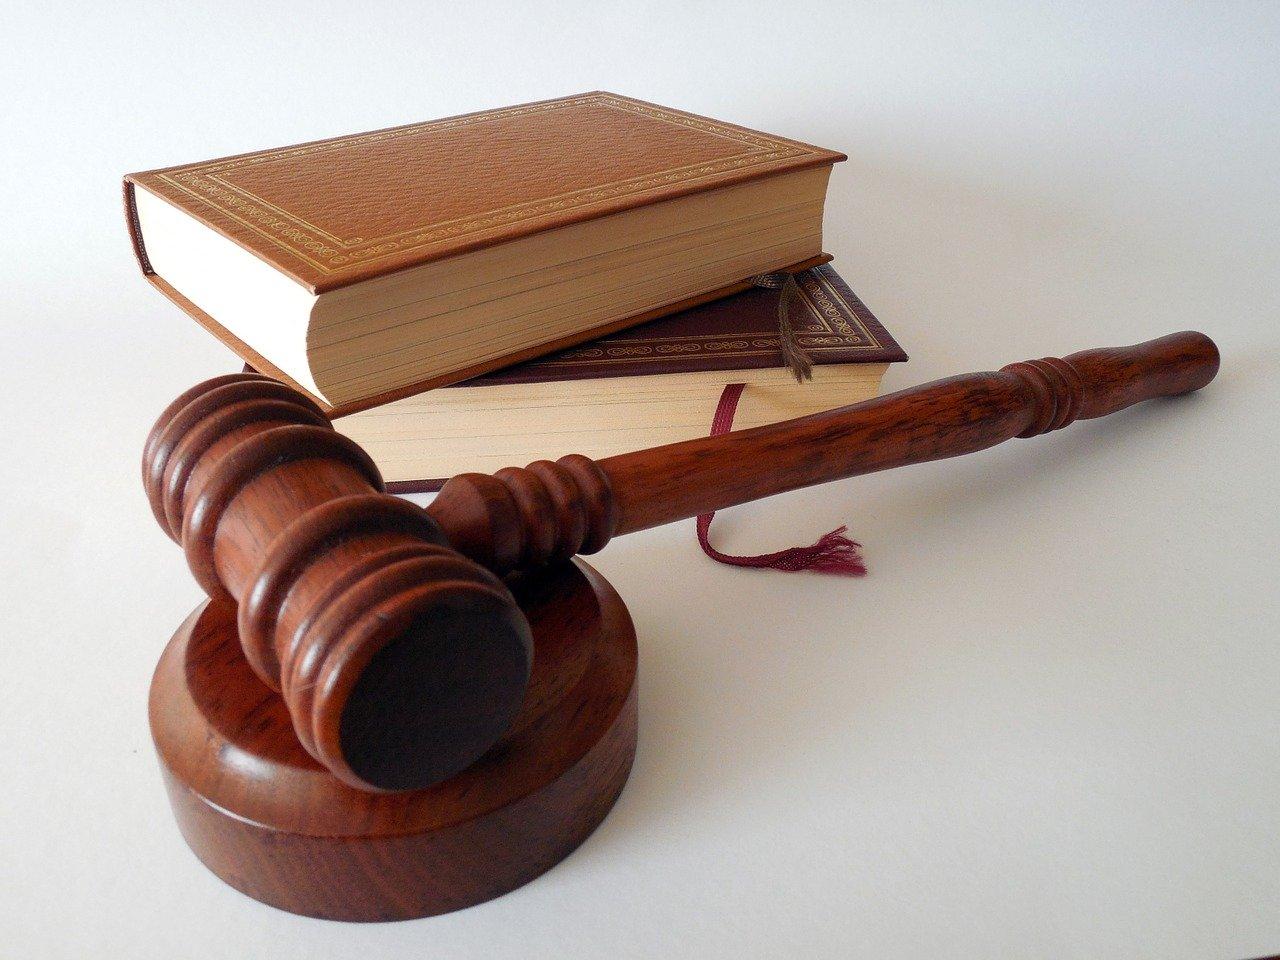 Recent Tennessee law school graduates seek diploma privilege in lieu of bar exam